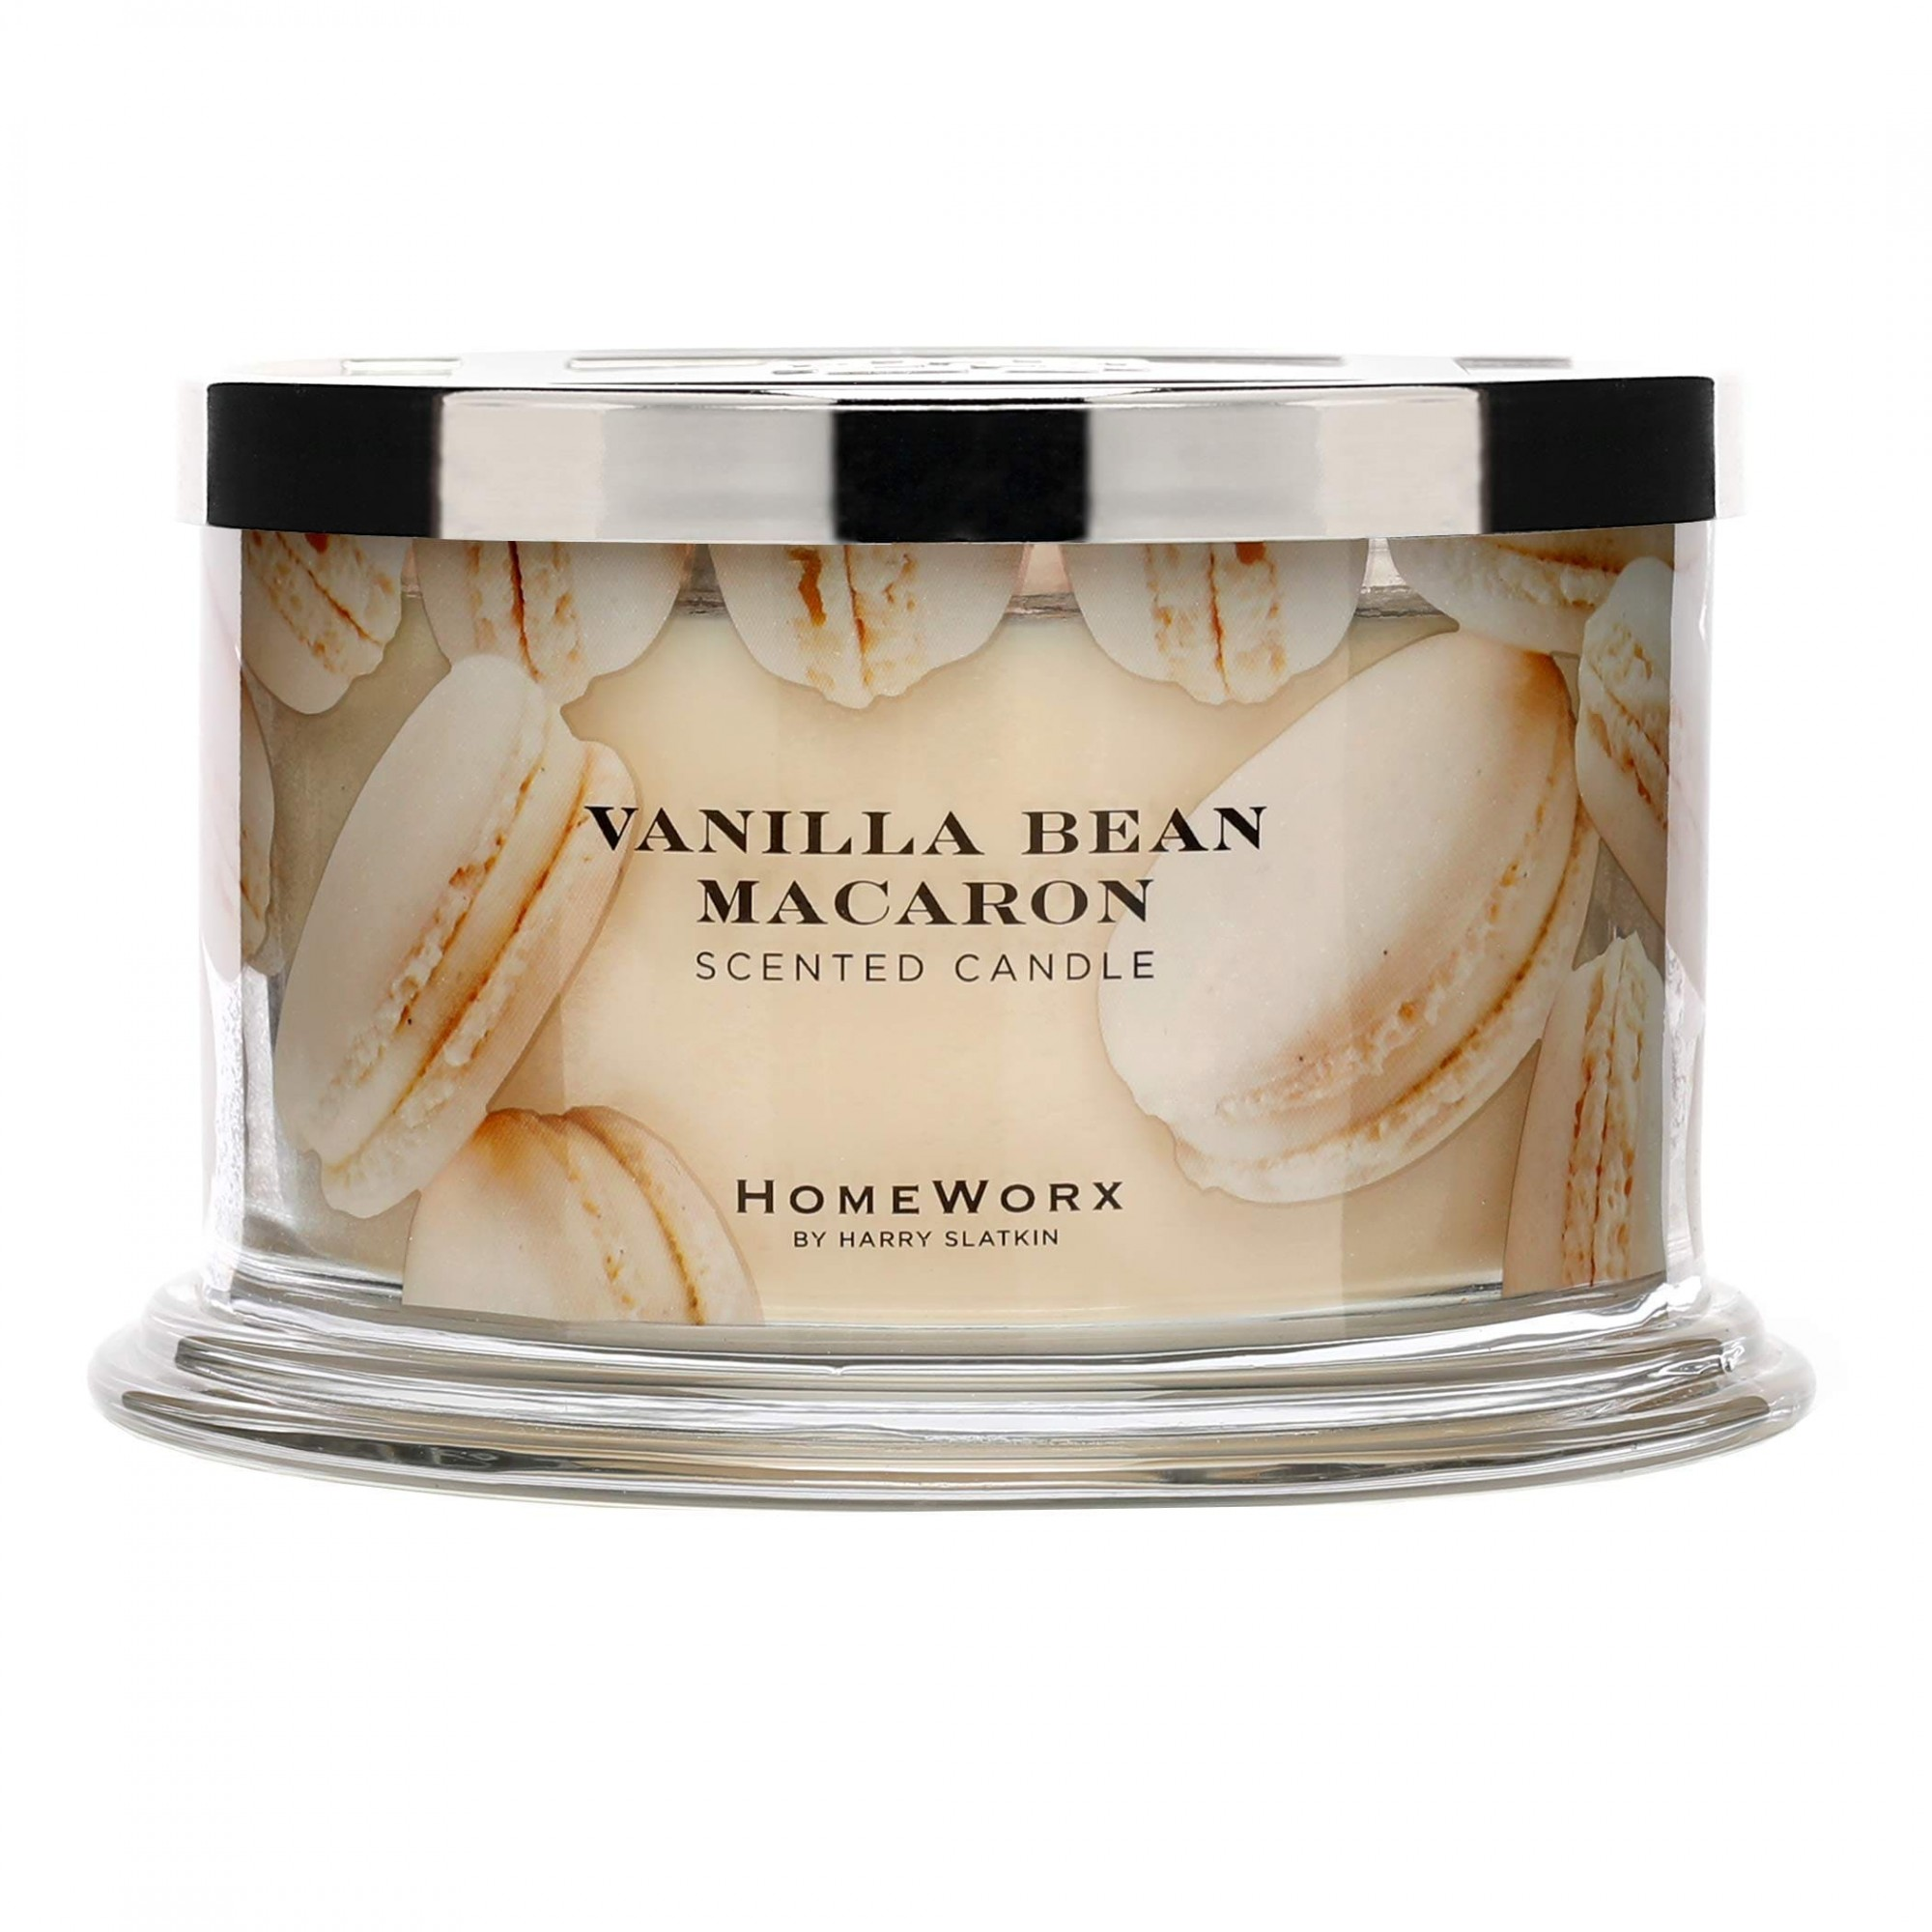 Homeworx by Harry Slatkin Vanilla Bean Macaron 4 Wick Candle